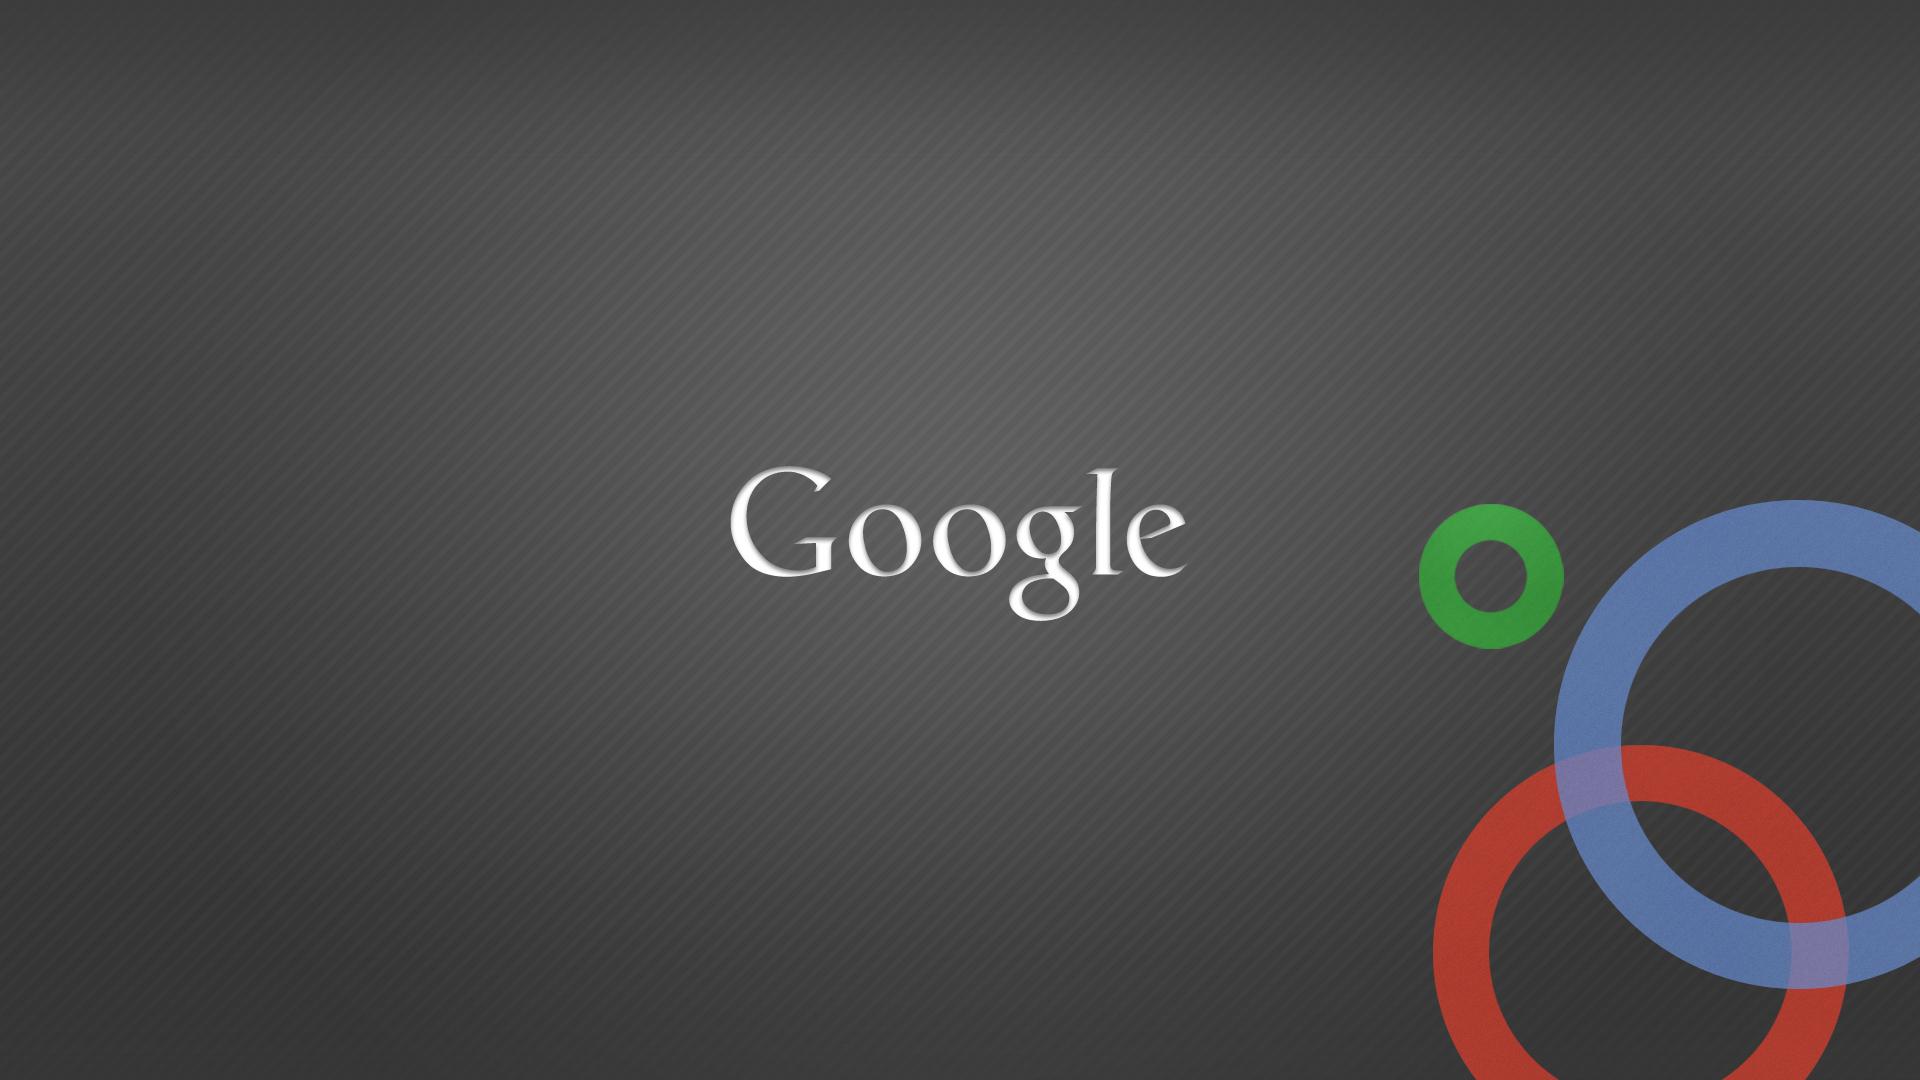 google wallpaper computer 1920x1080 1920x1080